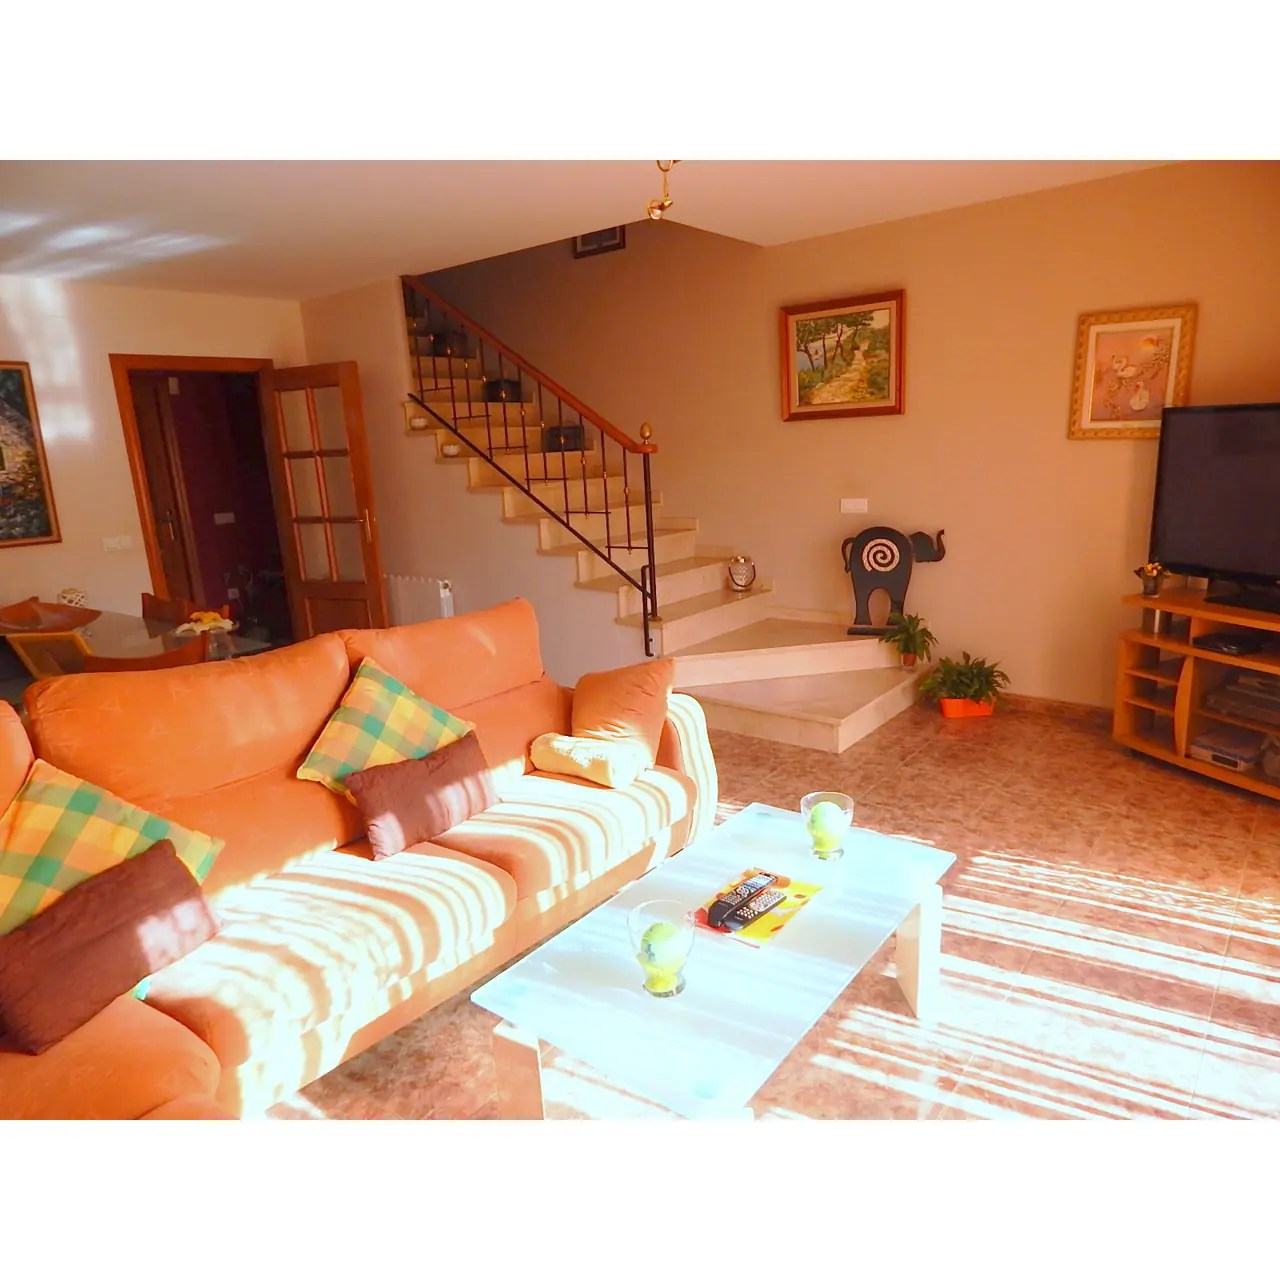 2212  Palafrugell Maison avec piscine priv et garage double